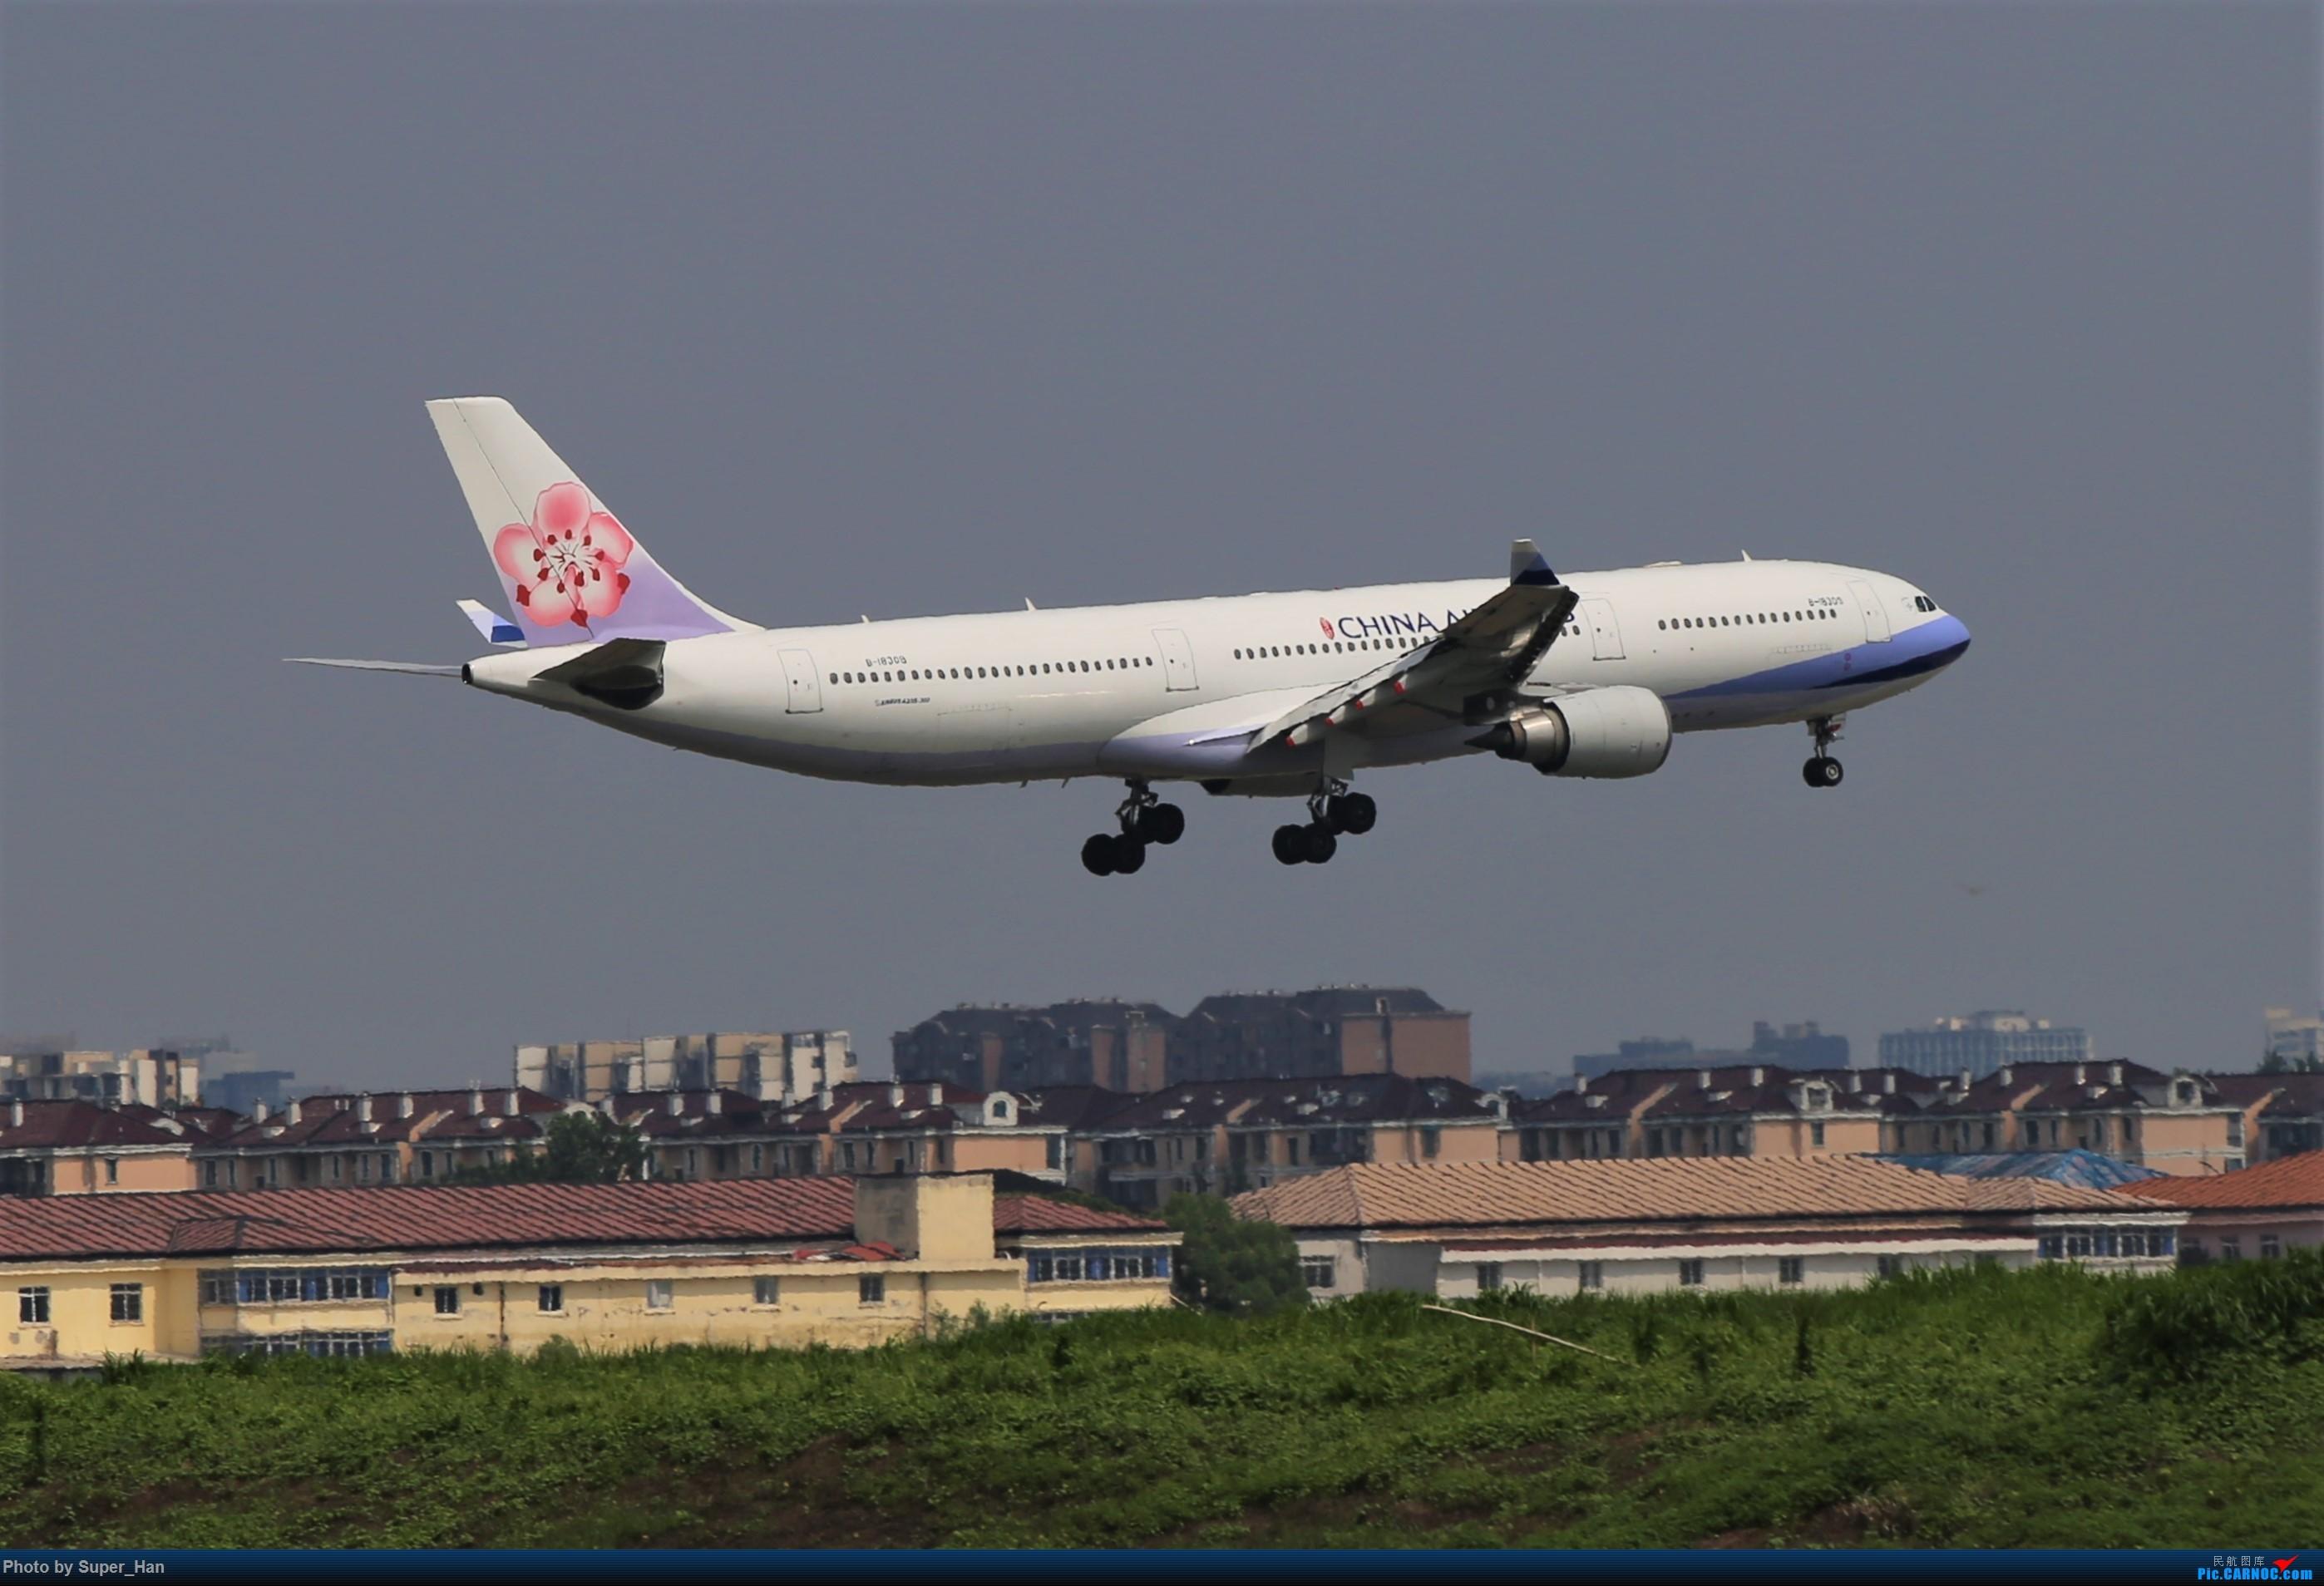 Re:[原创]0715去虹桥说走就走【最多的330篇】 AIRBUS A330-300 B-18308 中国上海虹桥国际机场